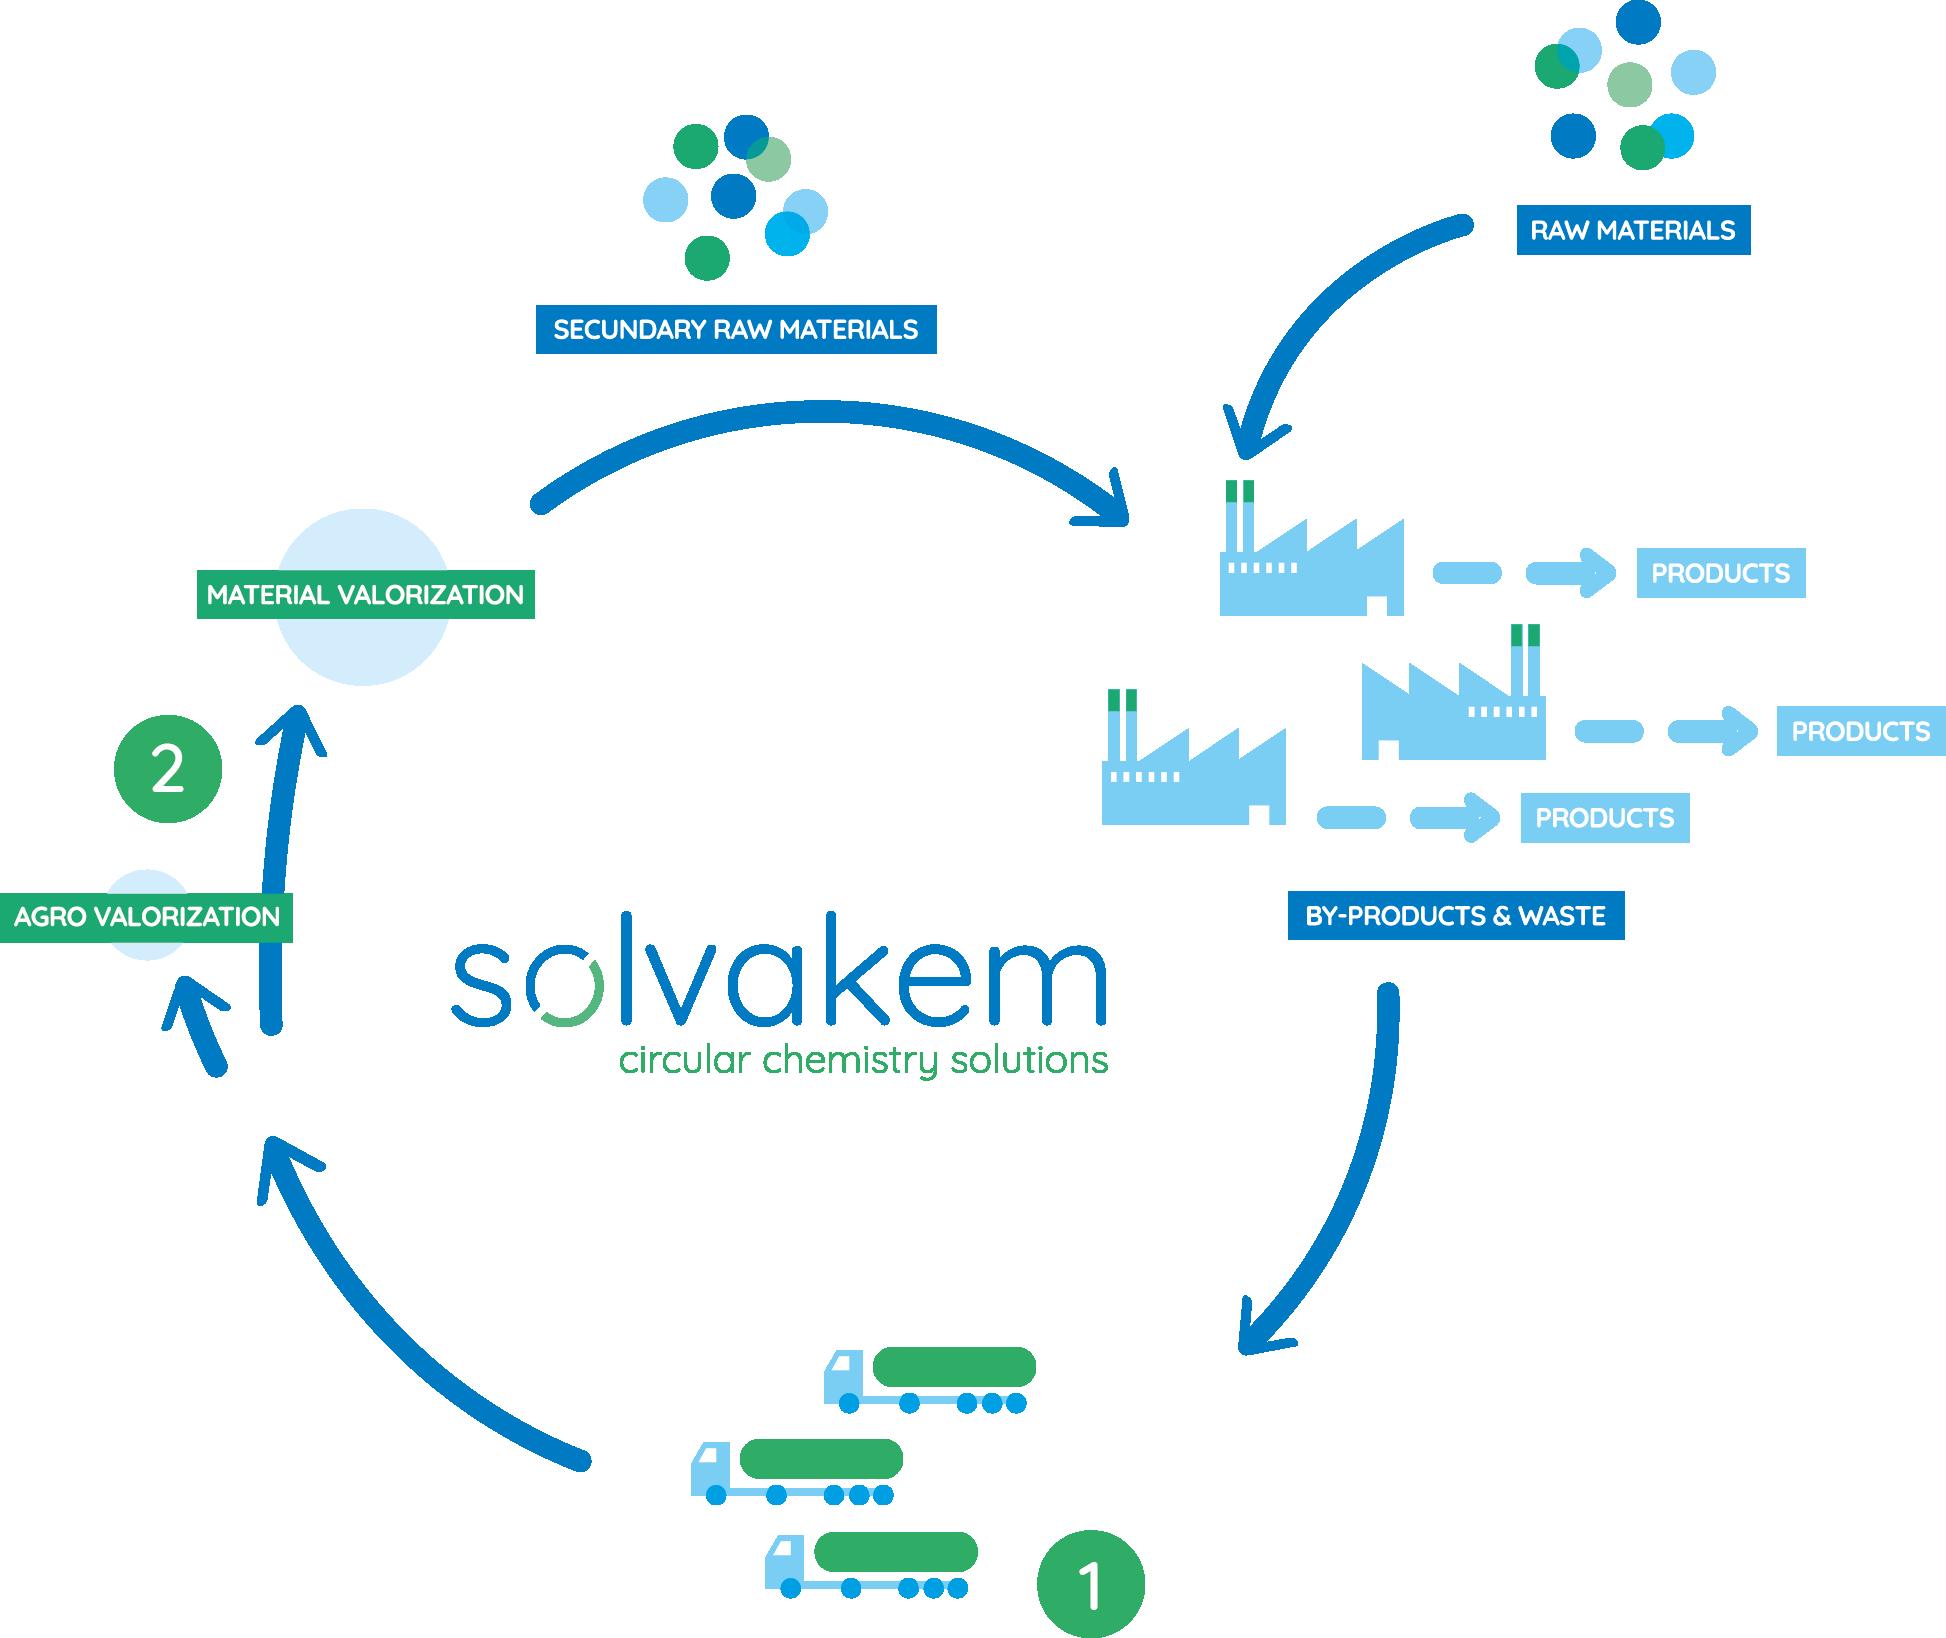 Gallery Solvakem Circular Chemistry Solutions 2